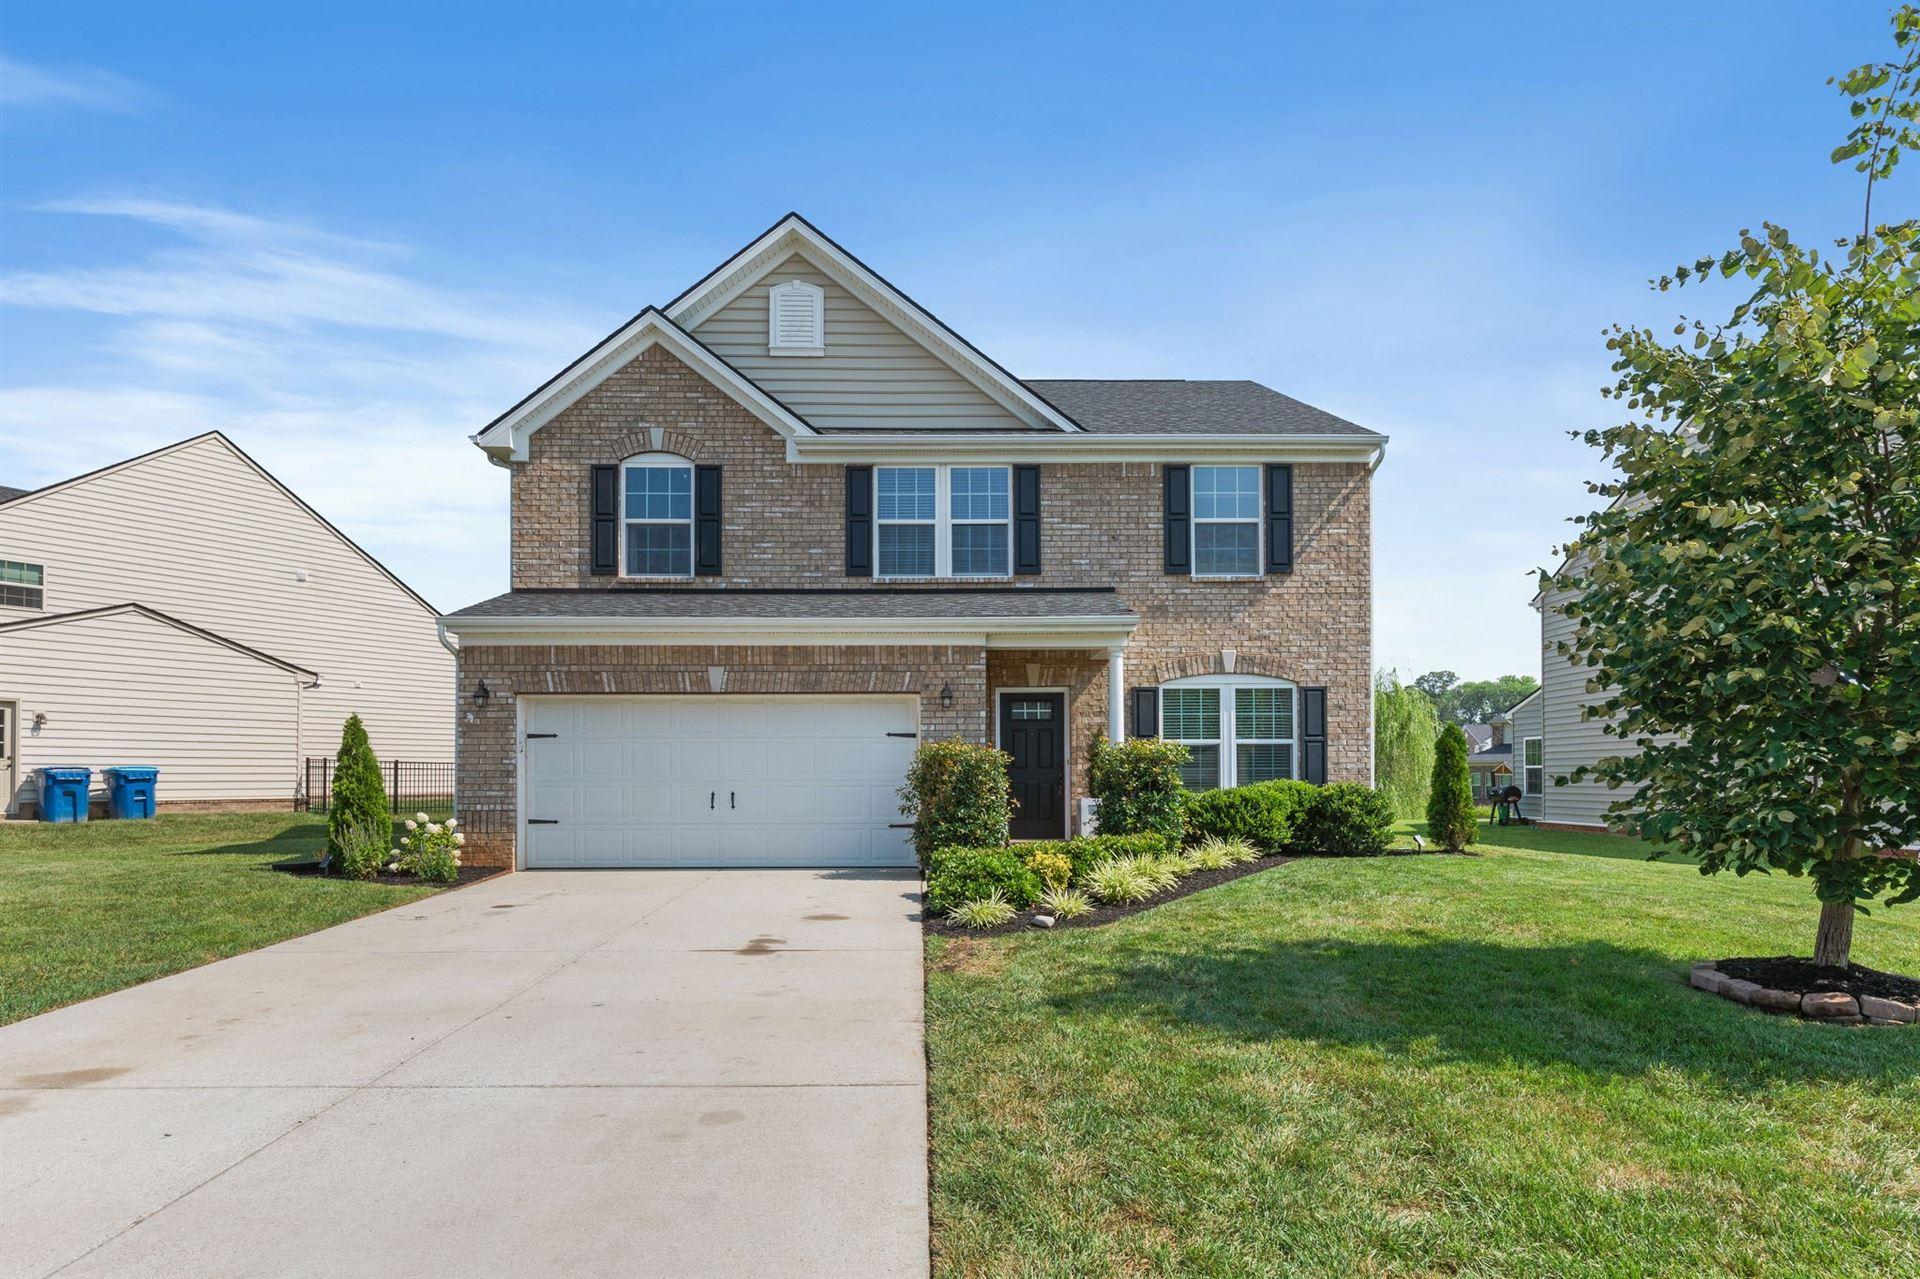 1355 Amboress Lane, Murfreesboro, TN 37128 - MLS#: 2276404